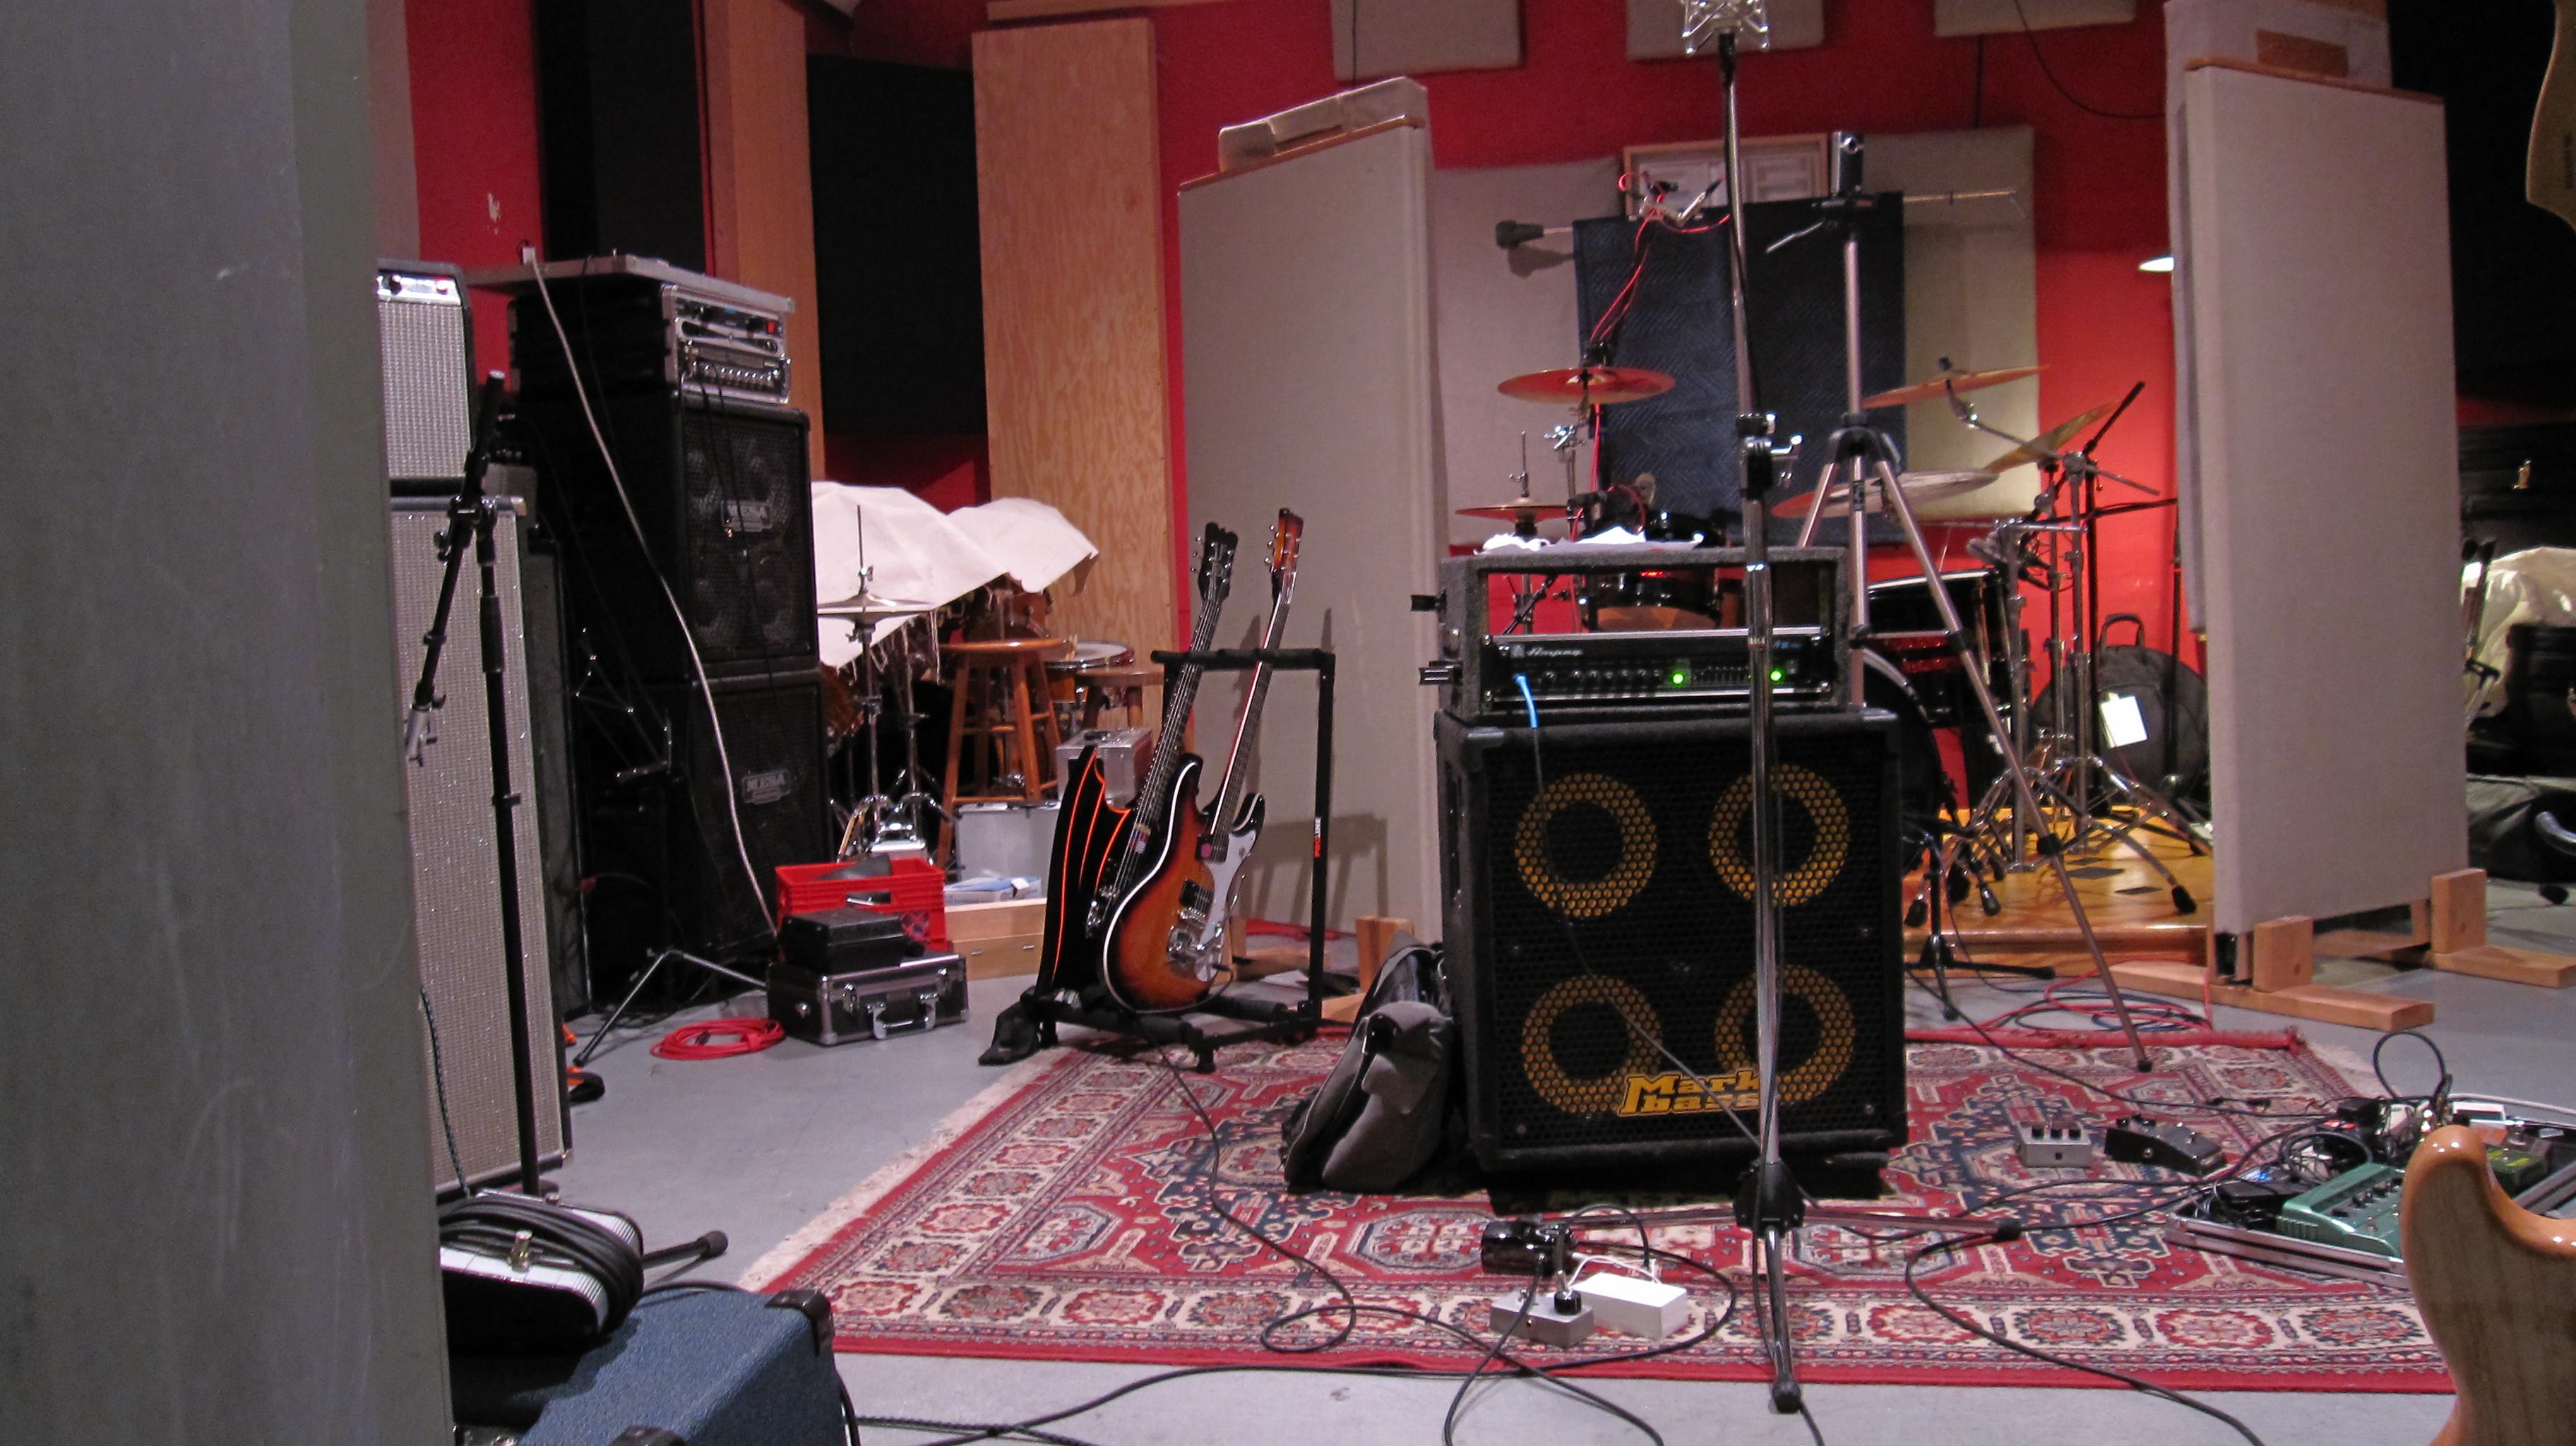 Little Red Wagon Studios Live Room Remodel A Jeff Hedback Design Recording Studio Wiring 5136177307 20f8edbfd4 O 1